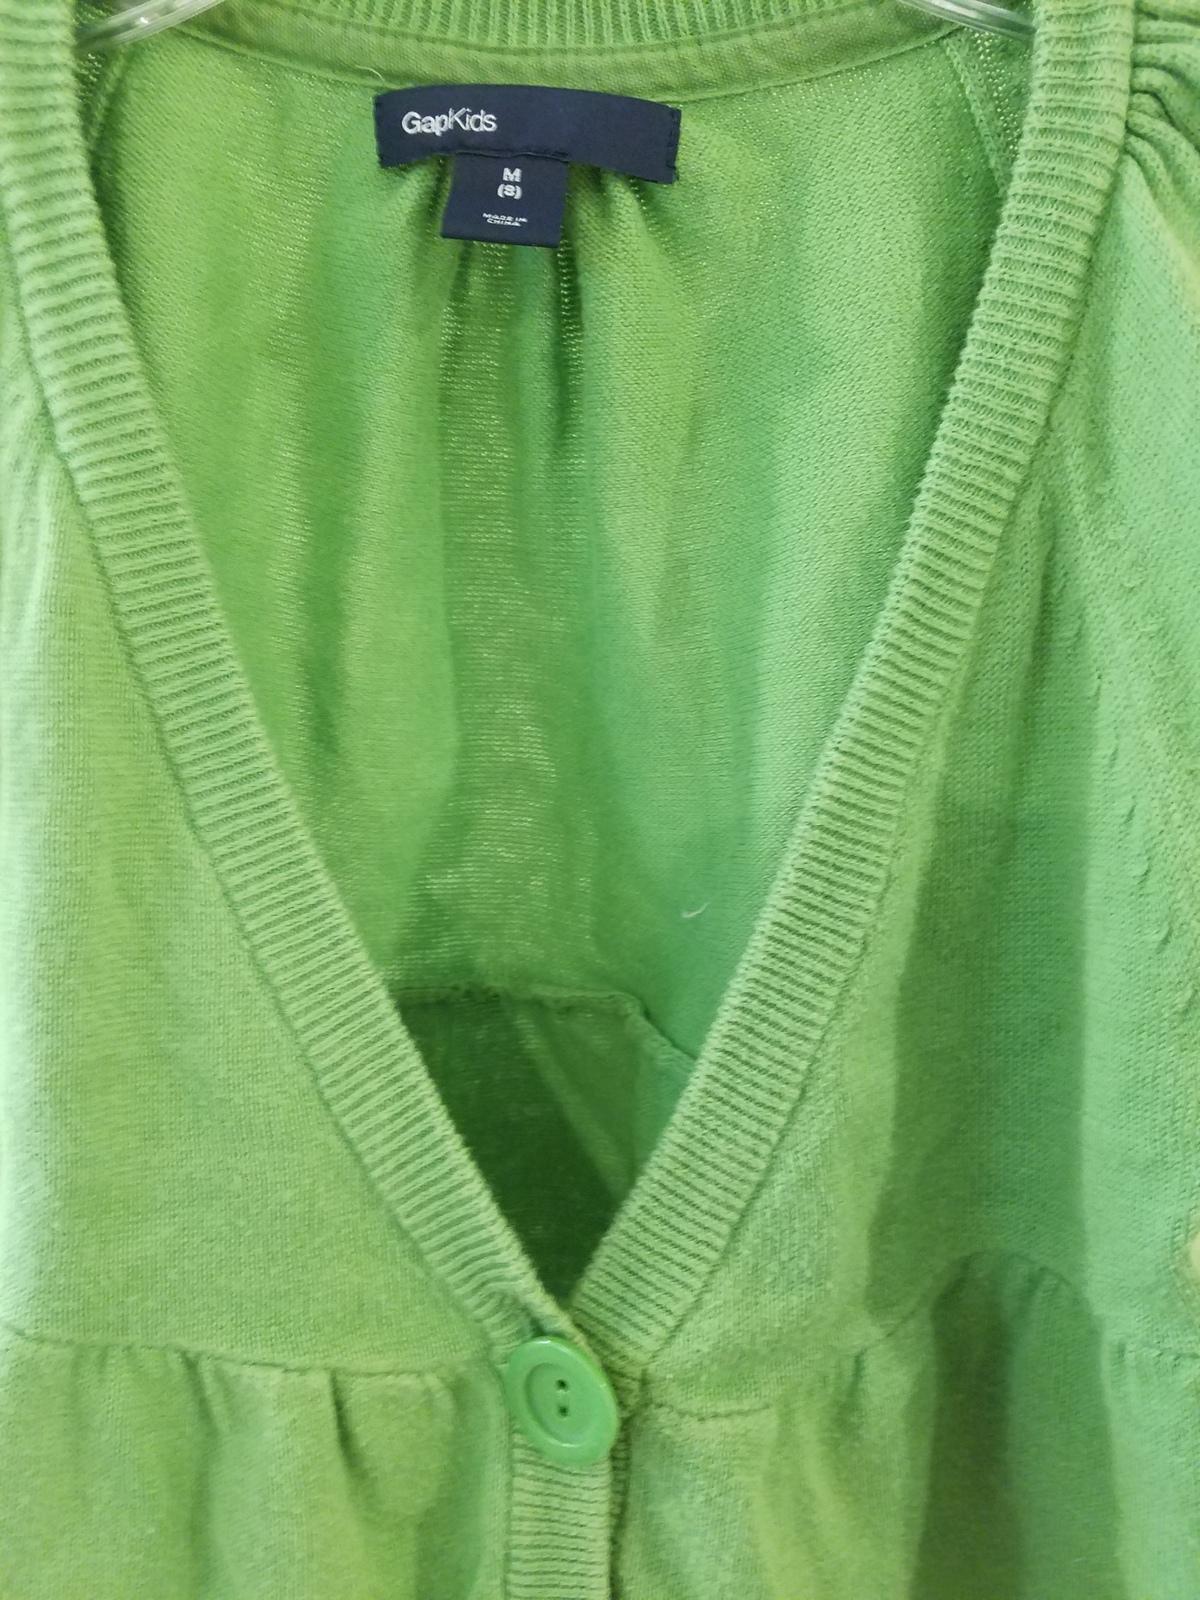 Gap Brand Girls Kids Children Top Sweater Cardigan Size 8 Green Short Sleeves  image 2